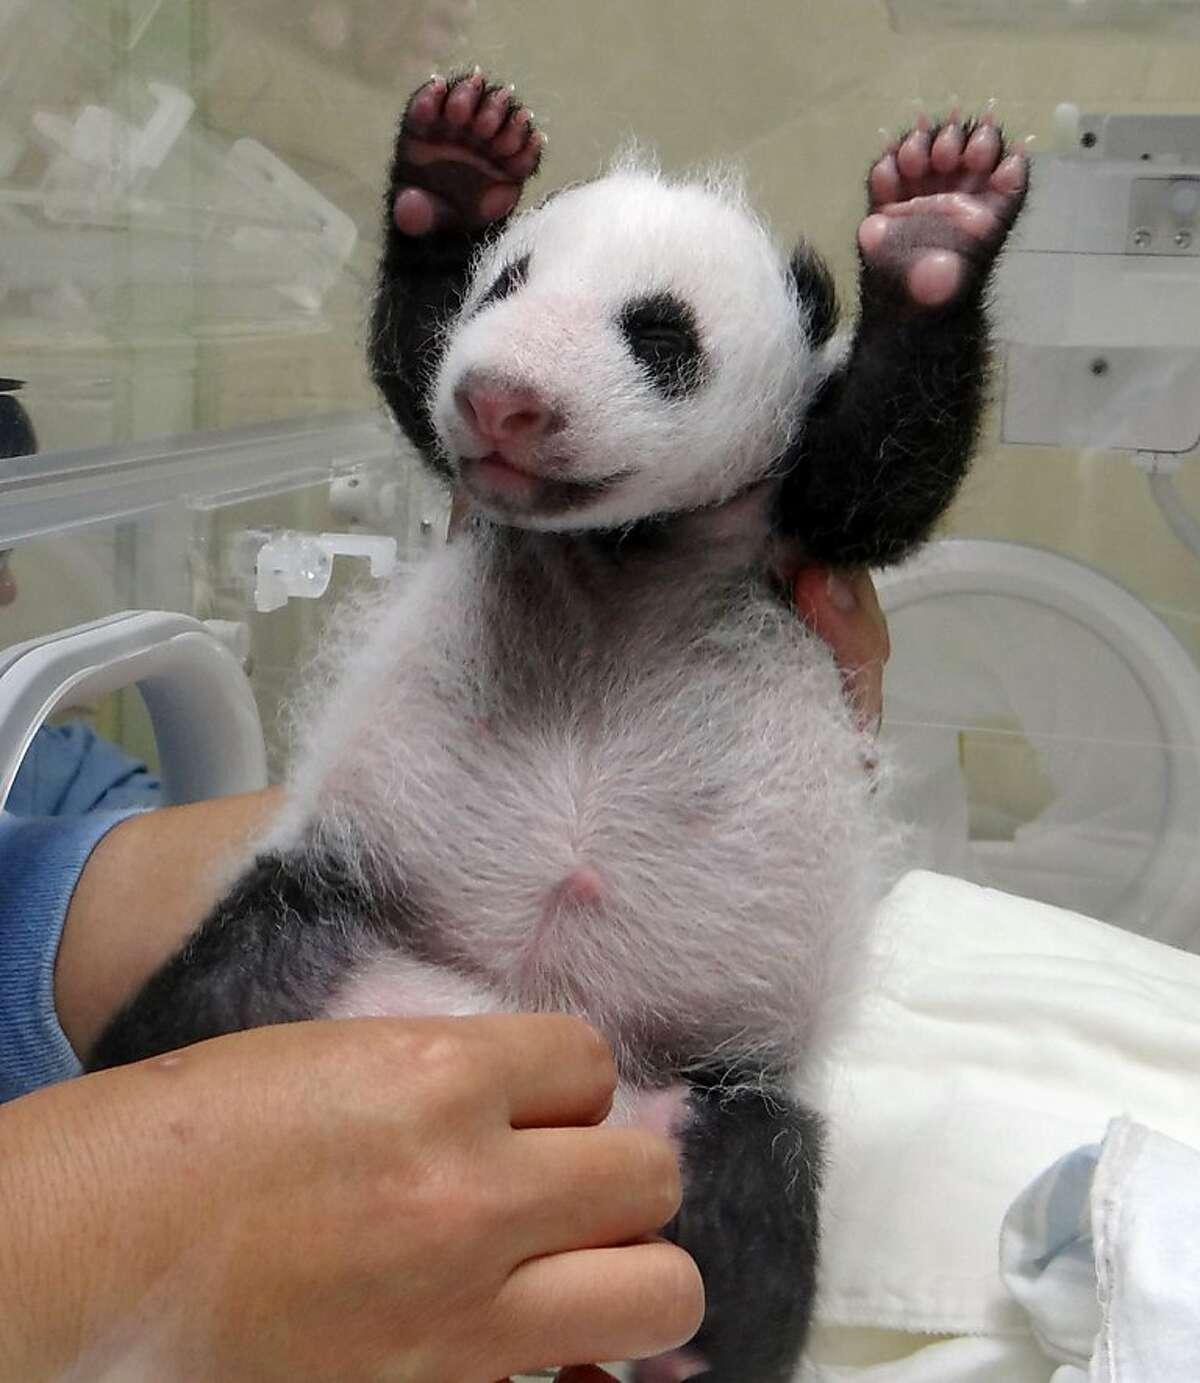 Whee! A zookeeper stimulates a newborn panda cub in its incubator at the Taipei City Zoo.